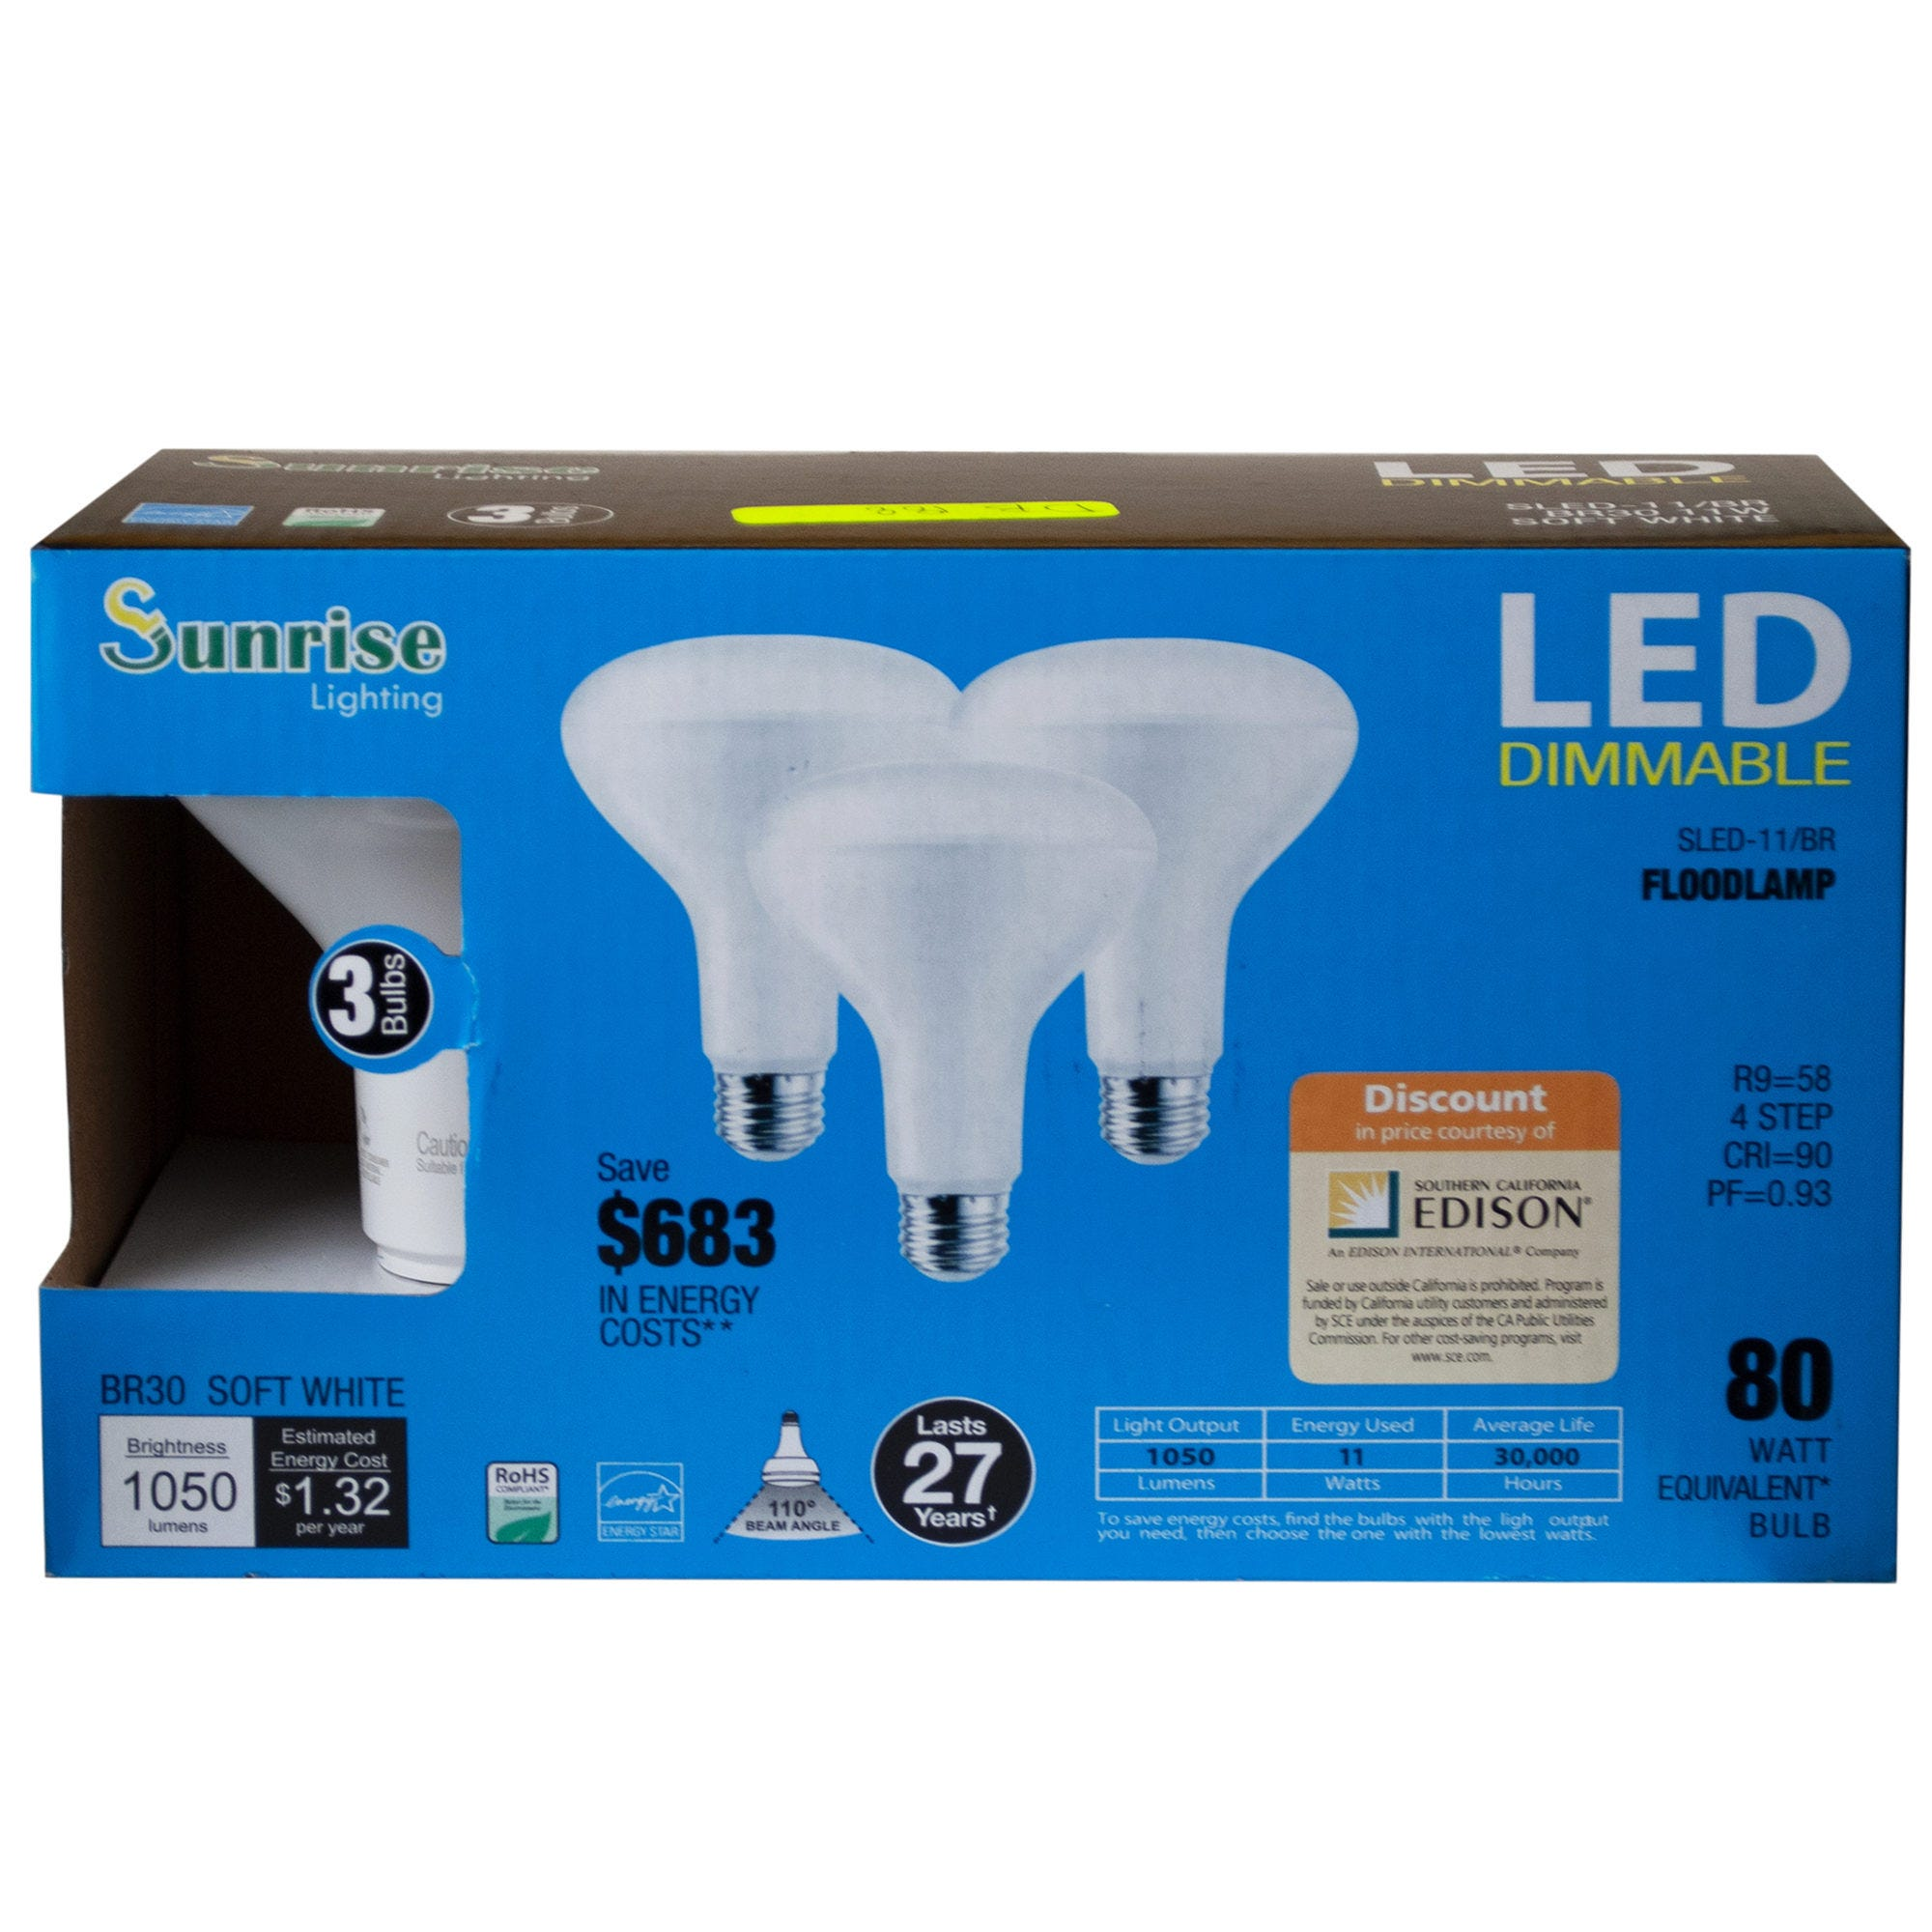 3 Pack 11 Watt LED Dimmable Soft White Floodlamp LIGHT BULBS- Qty 8